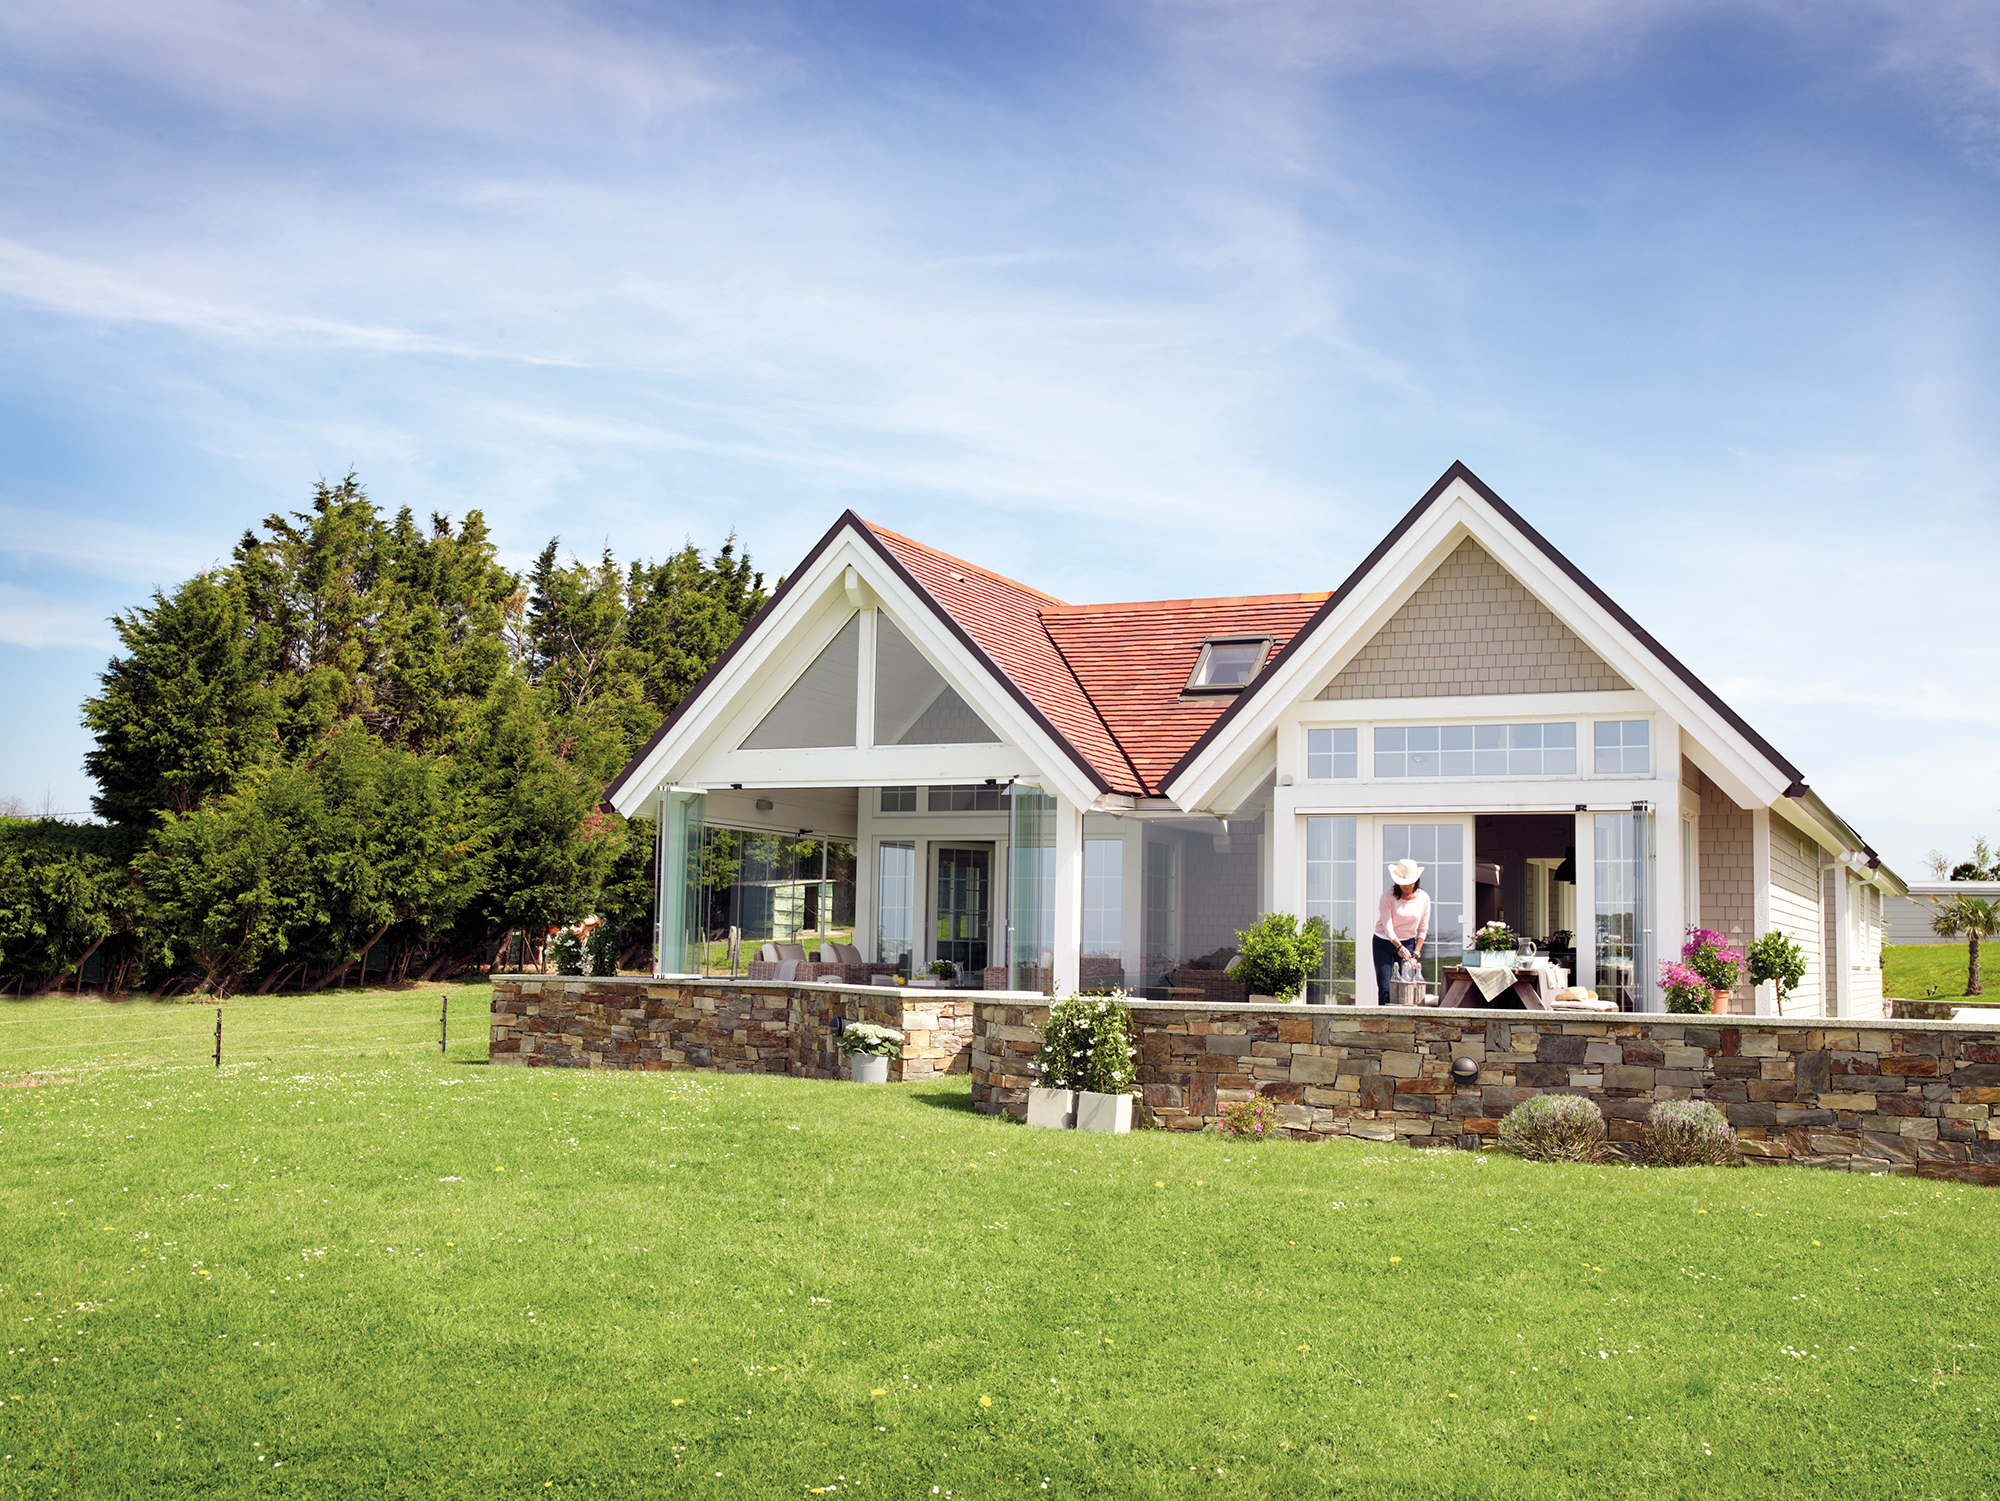 Casas de madera pros y contras for Modelo de fachadas de viviendas